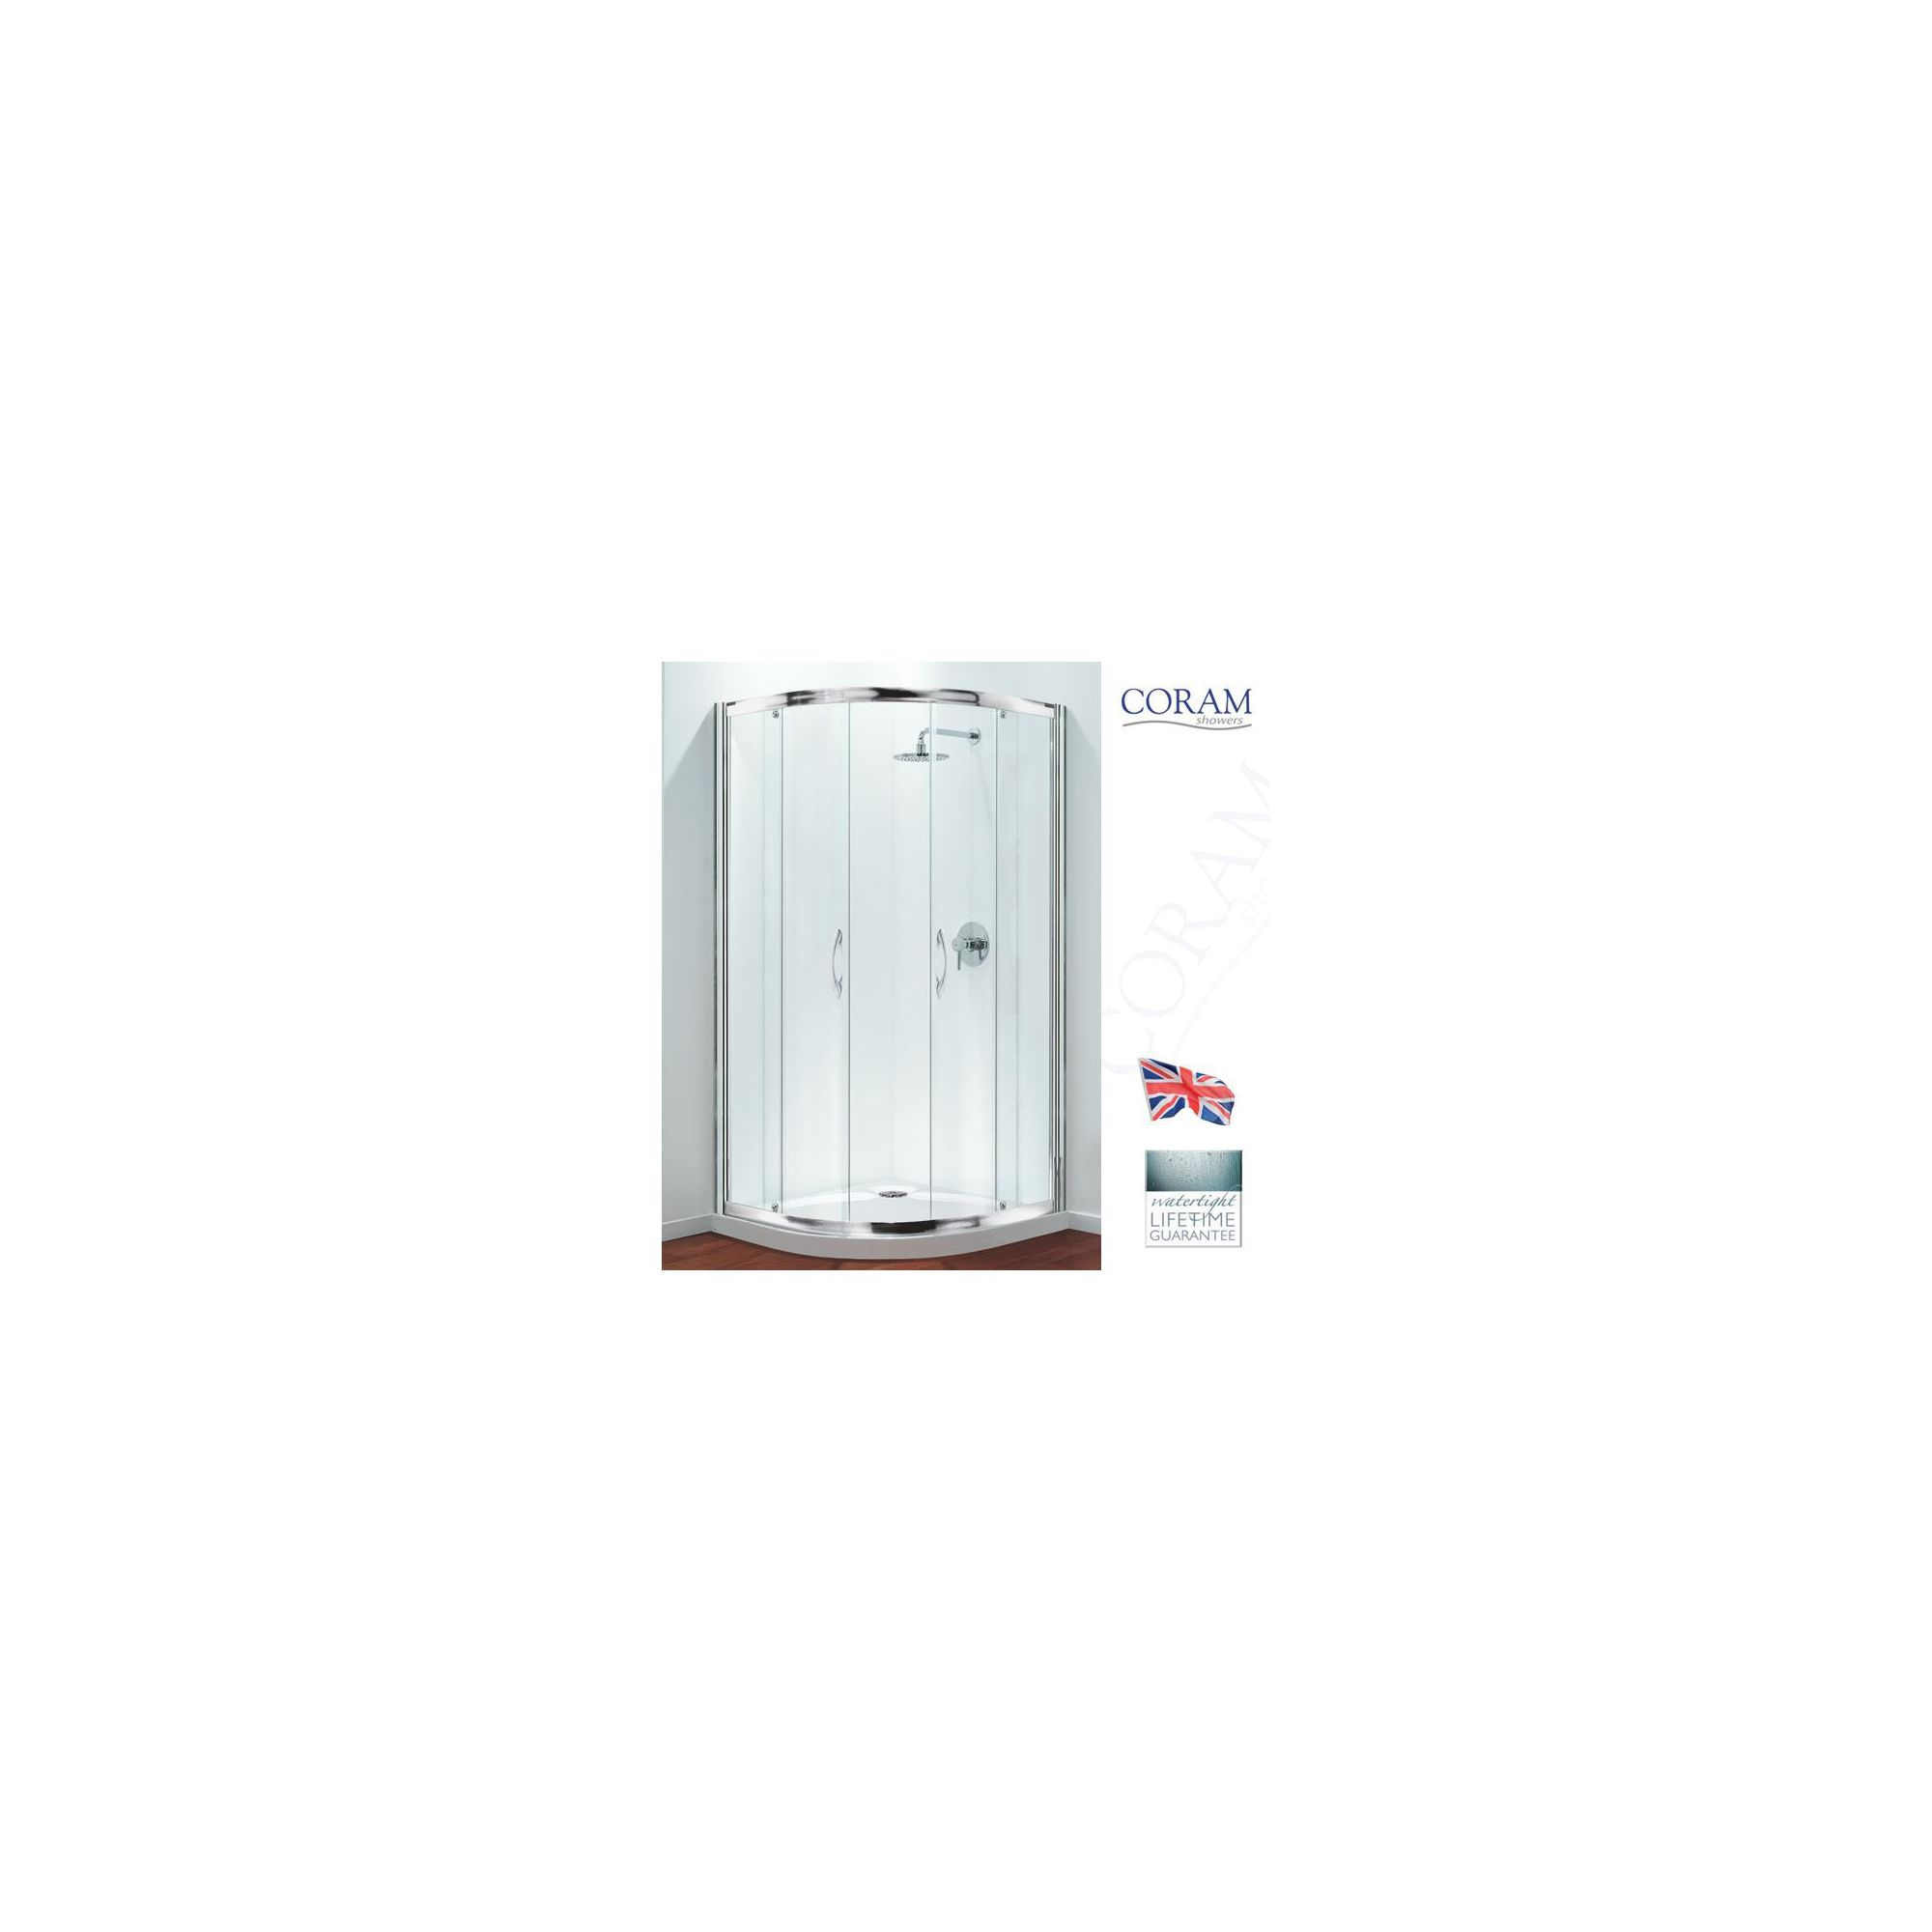 Coram Premier Quadrant Shower Enclosure, 800mm x 800mm, Low Profile Tray, 6mm Glass at Tesco Direct